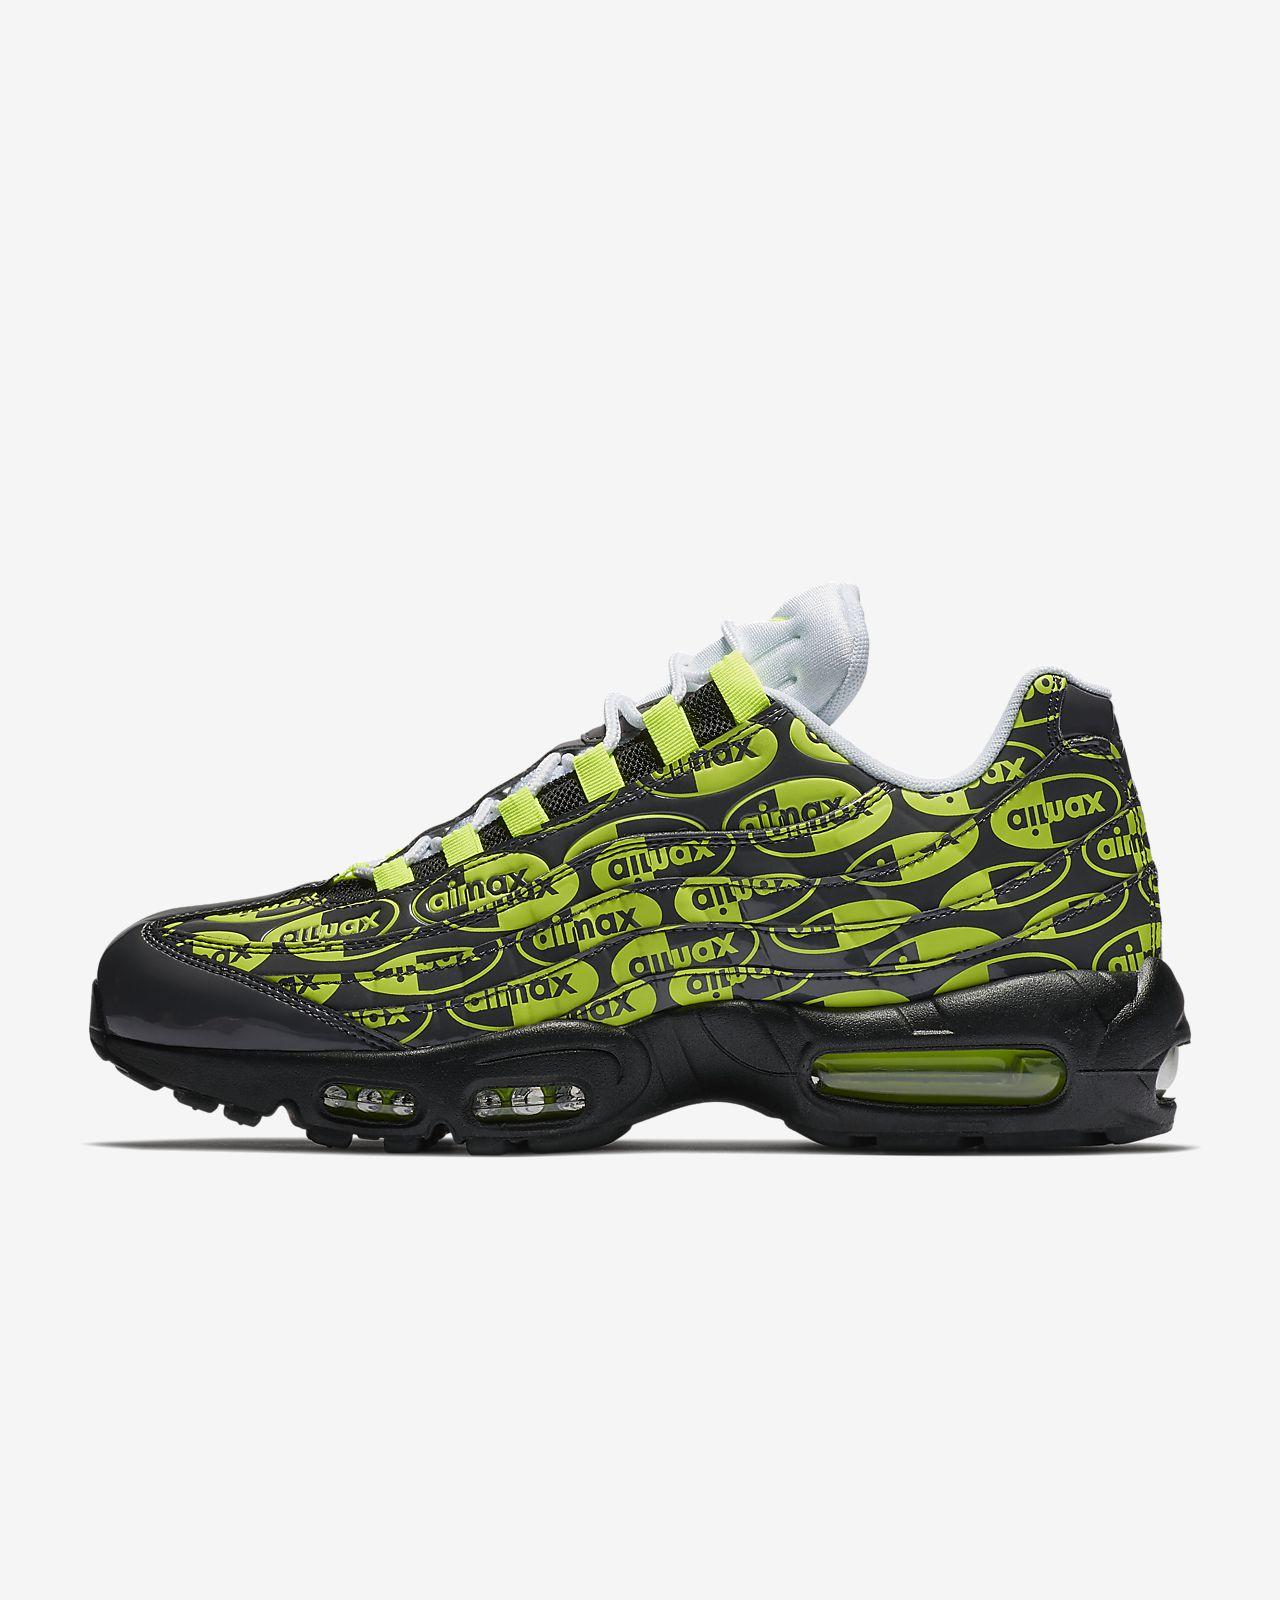 brand new 1181f 14e12 ... Nike Air Max 95 Premium – sko til mænd